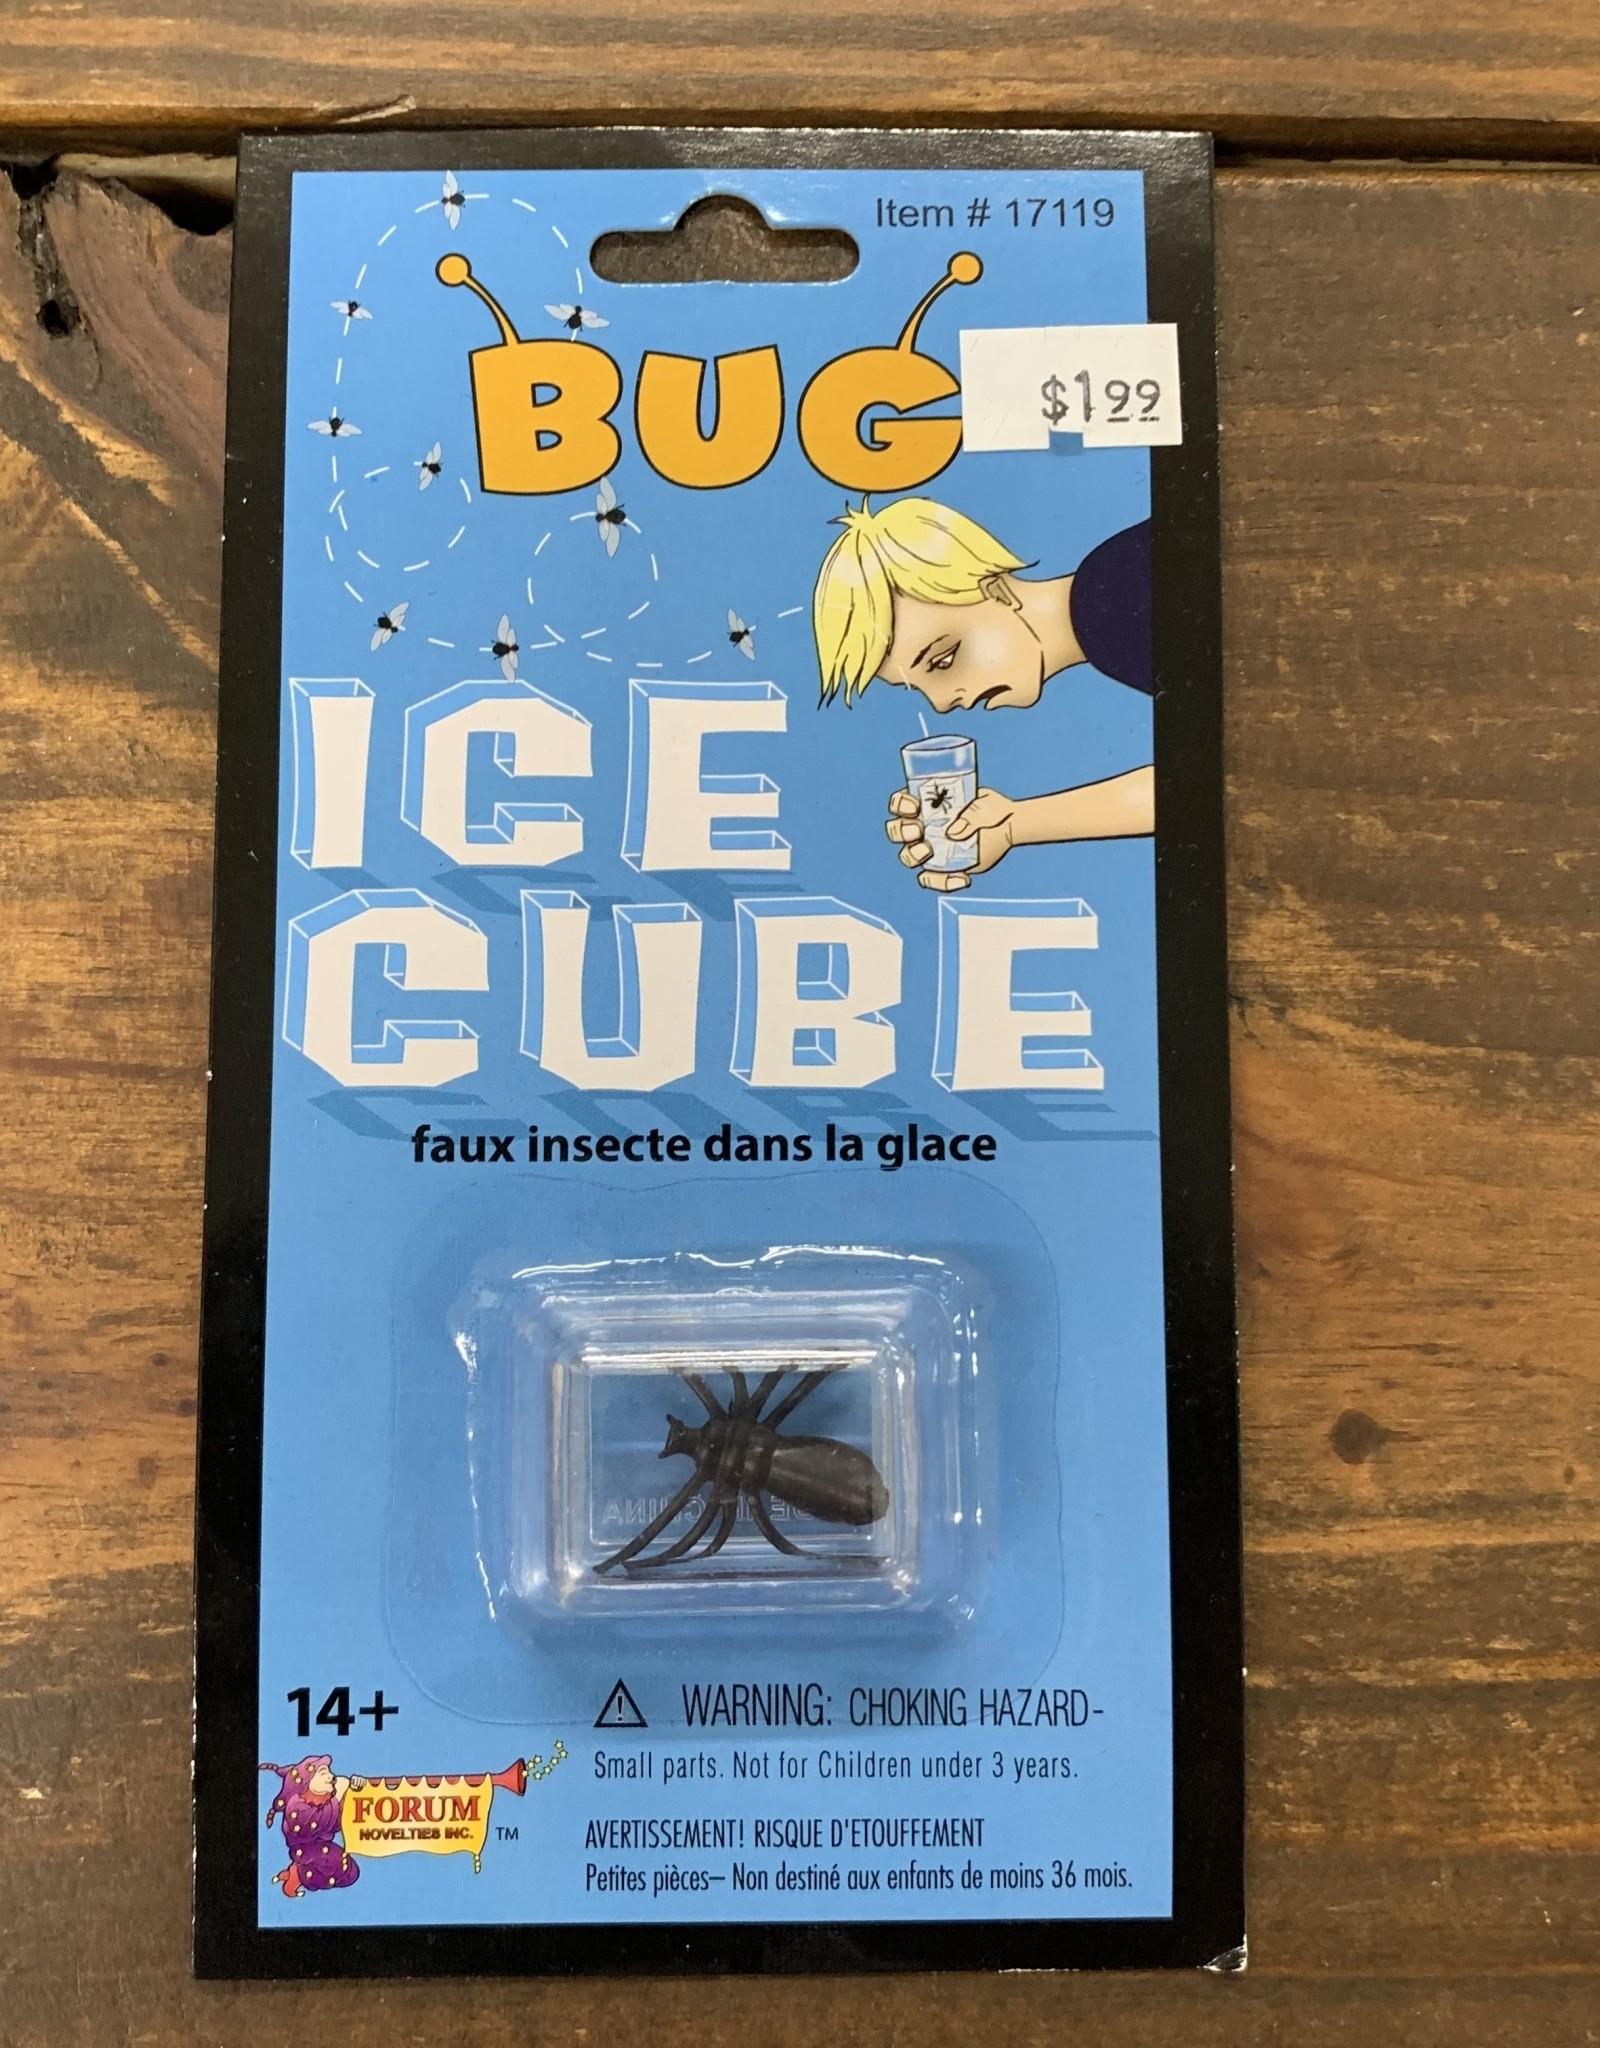 BUG ICE CUBE